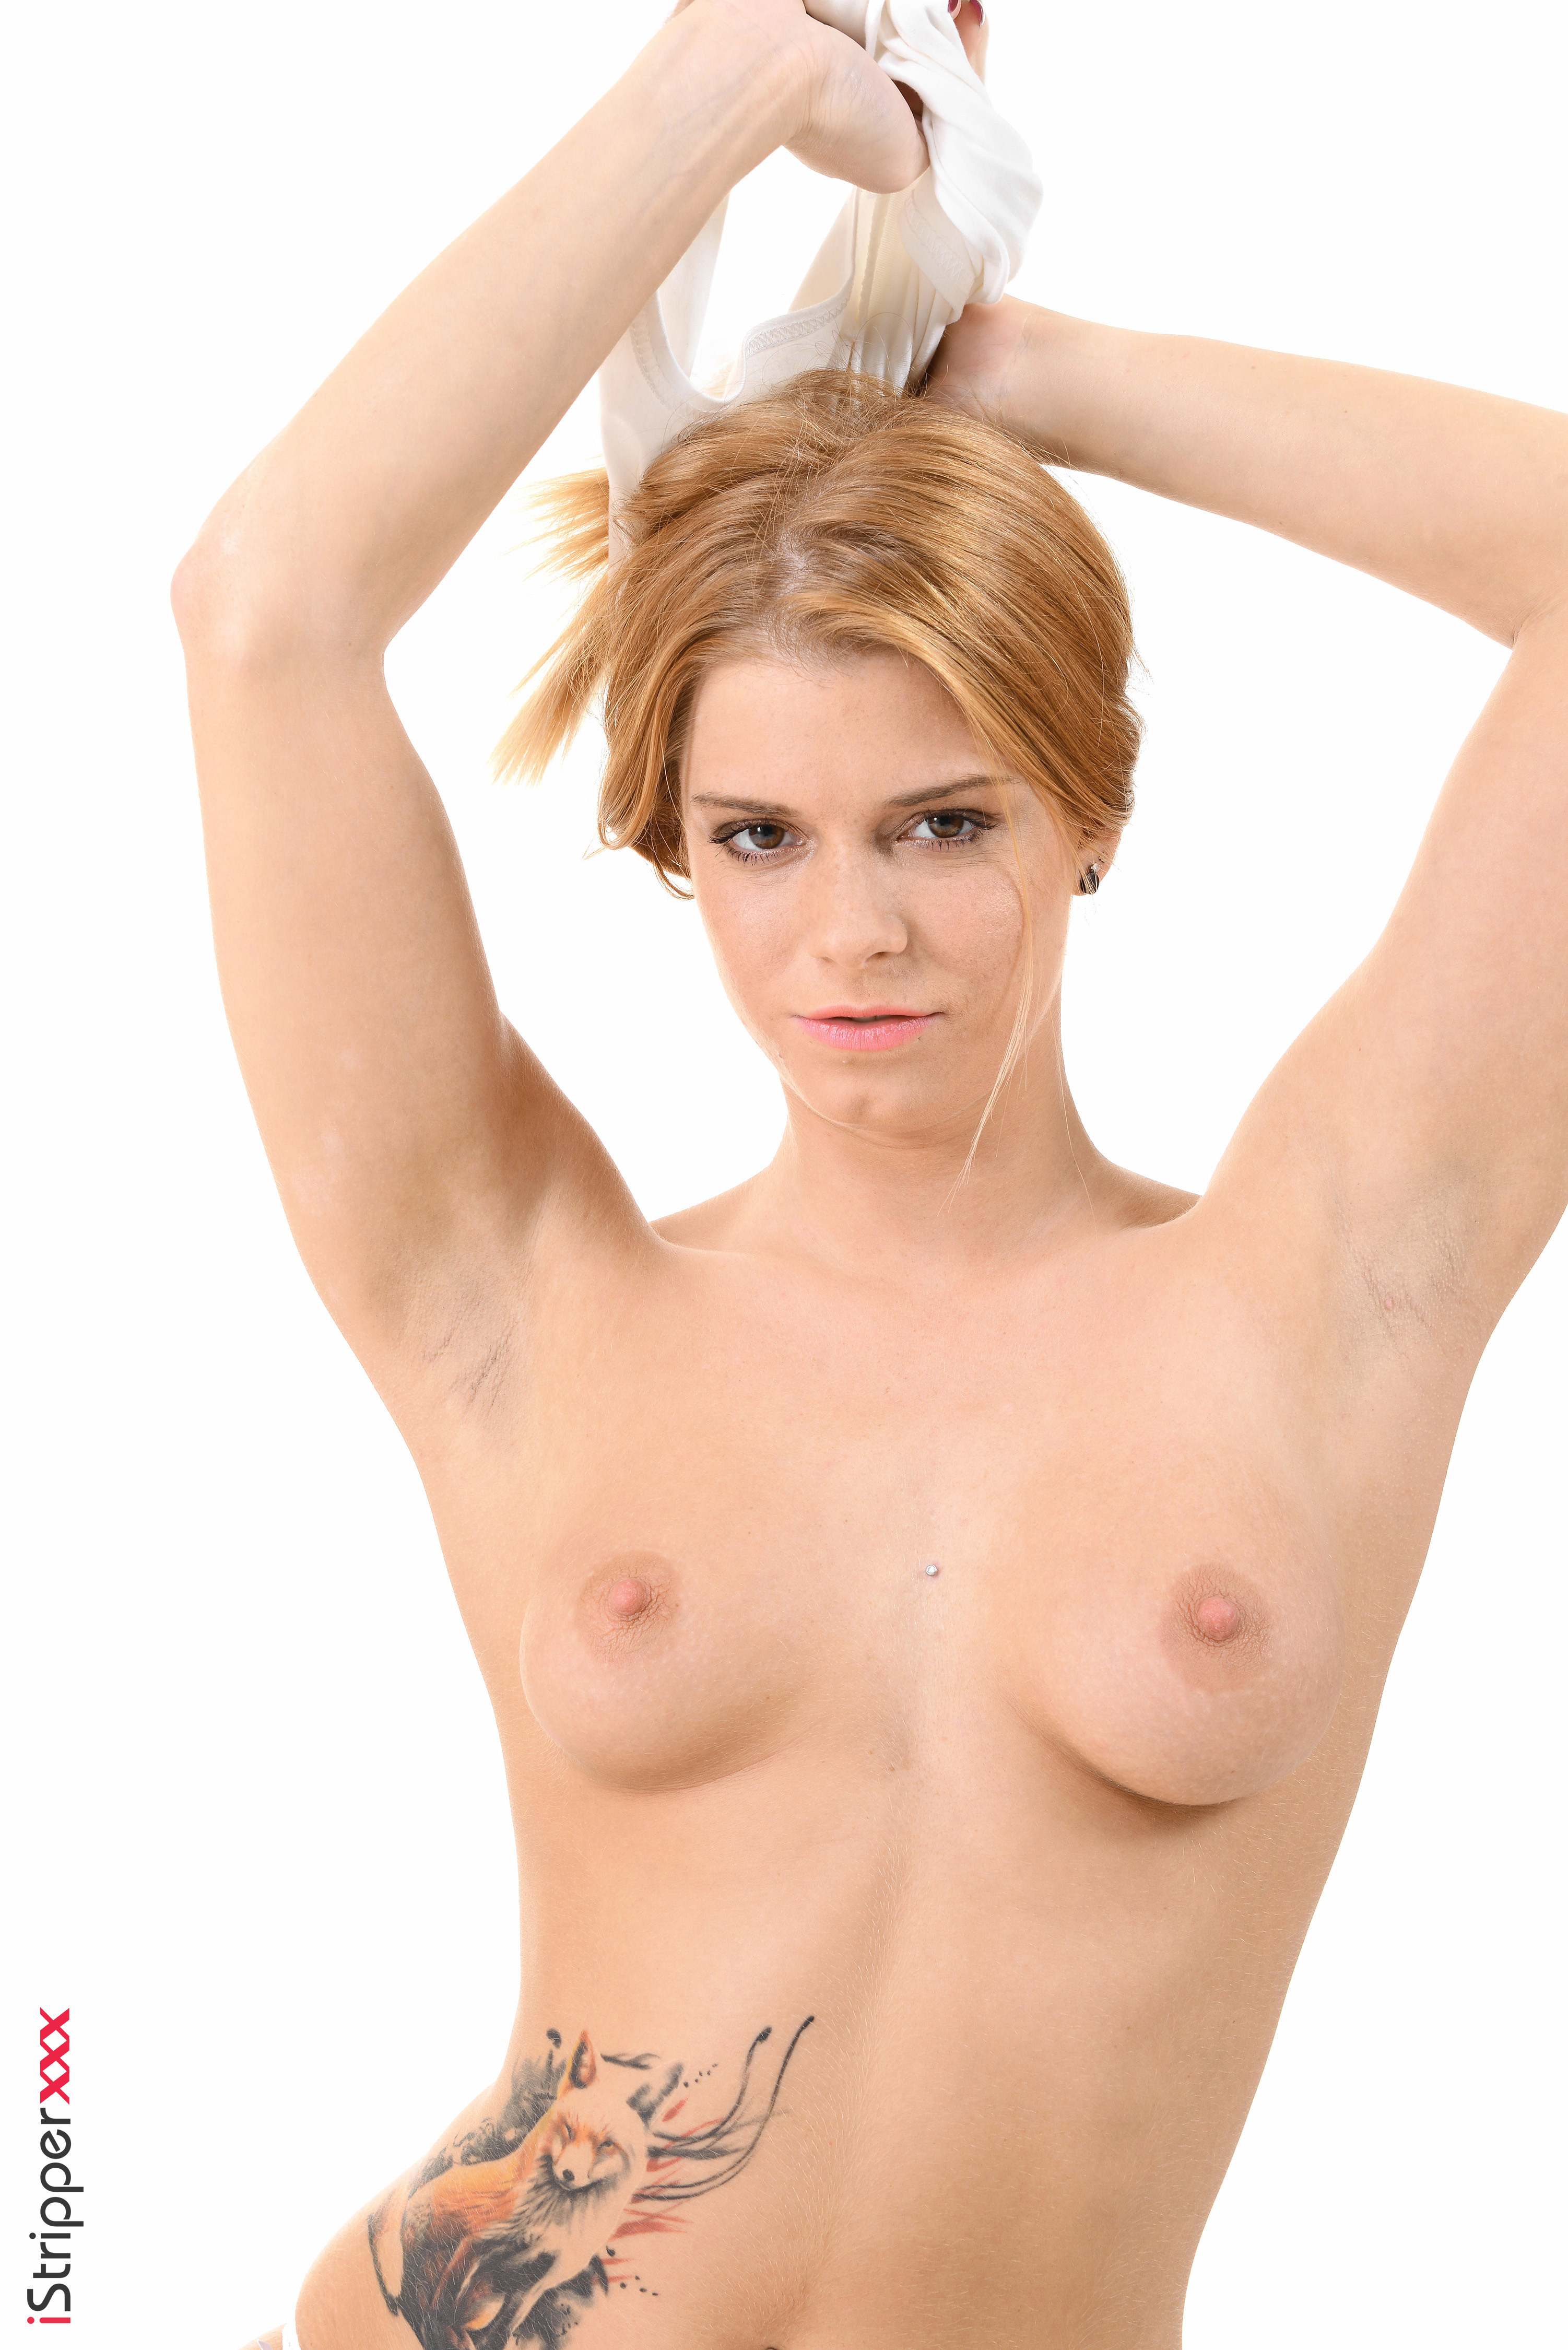 girls stripping web cams